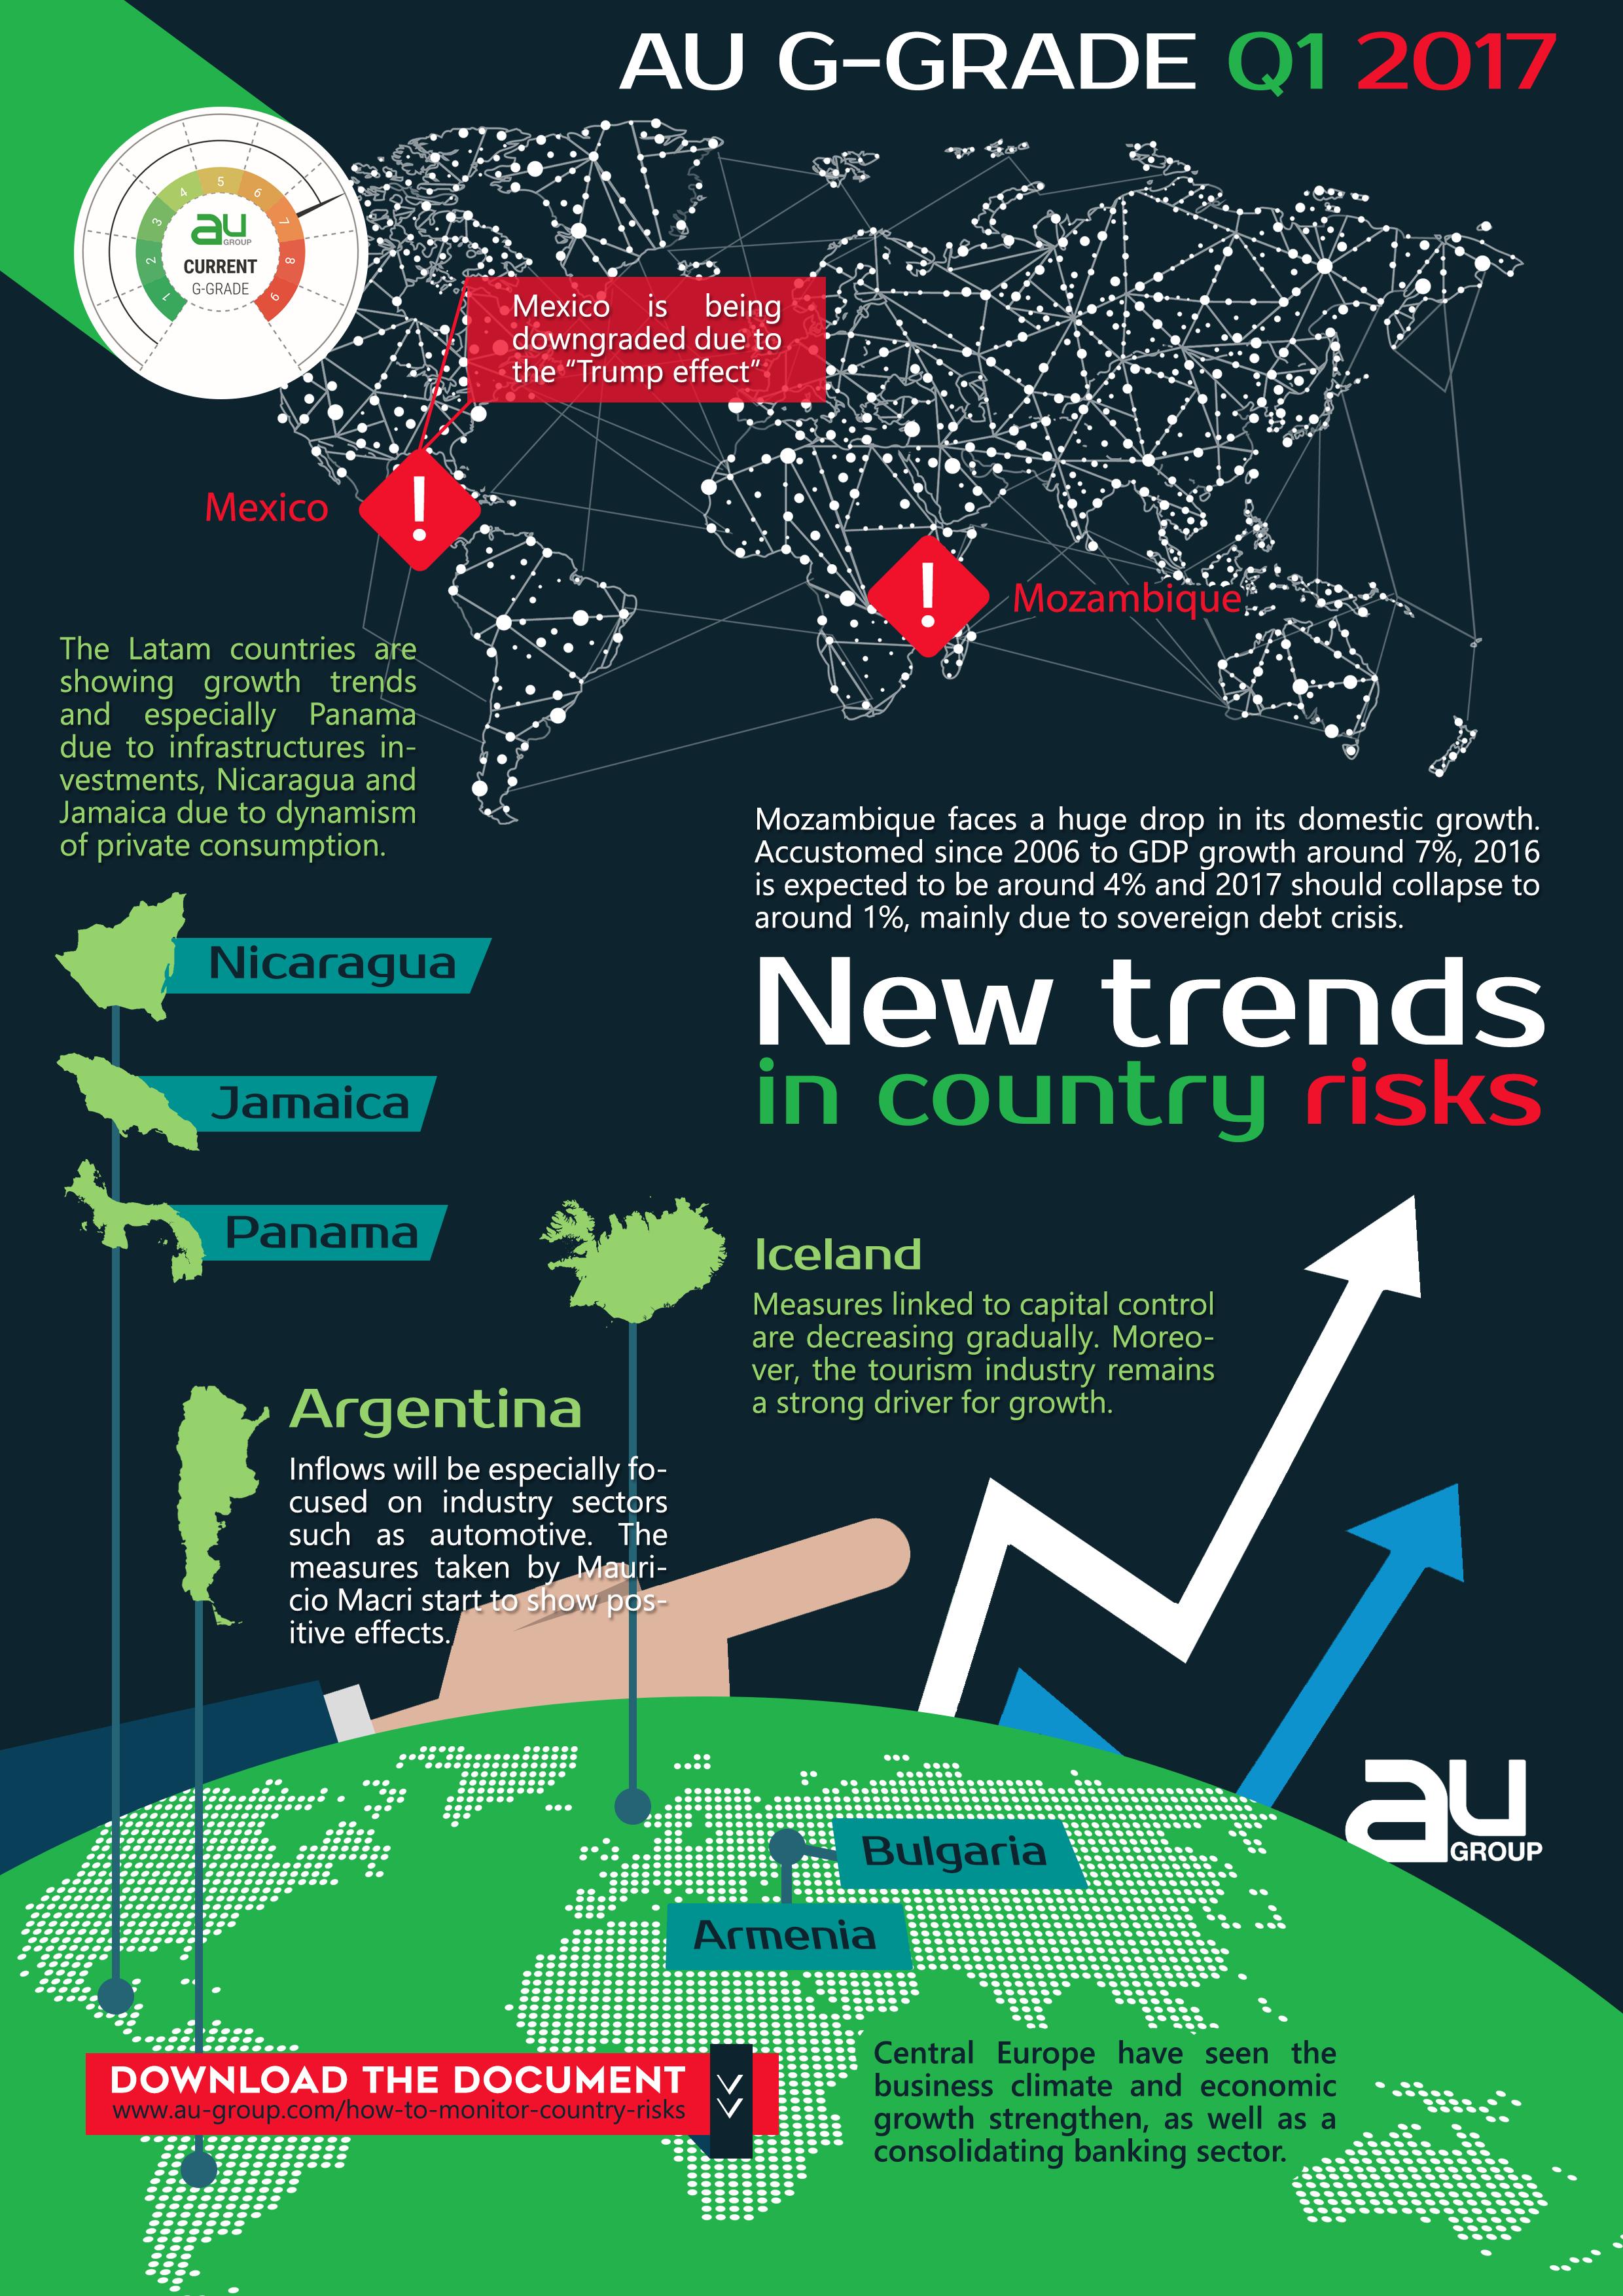 G-Grade Q1 Infographic